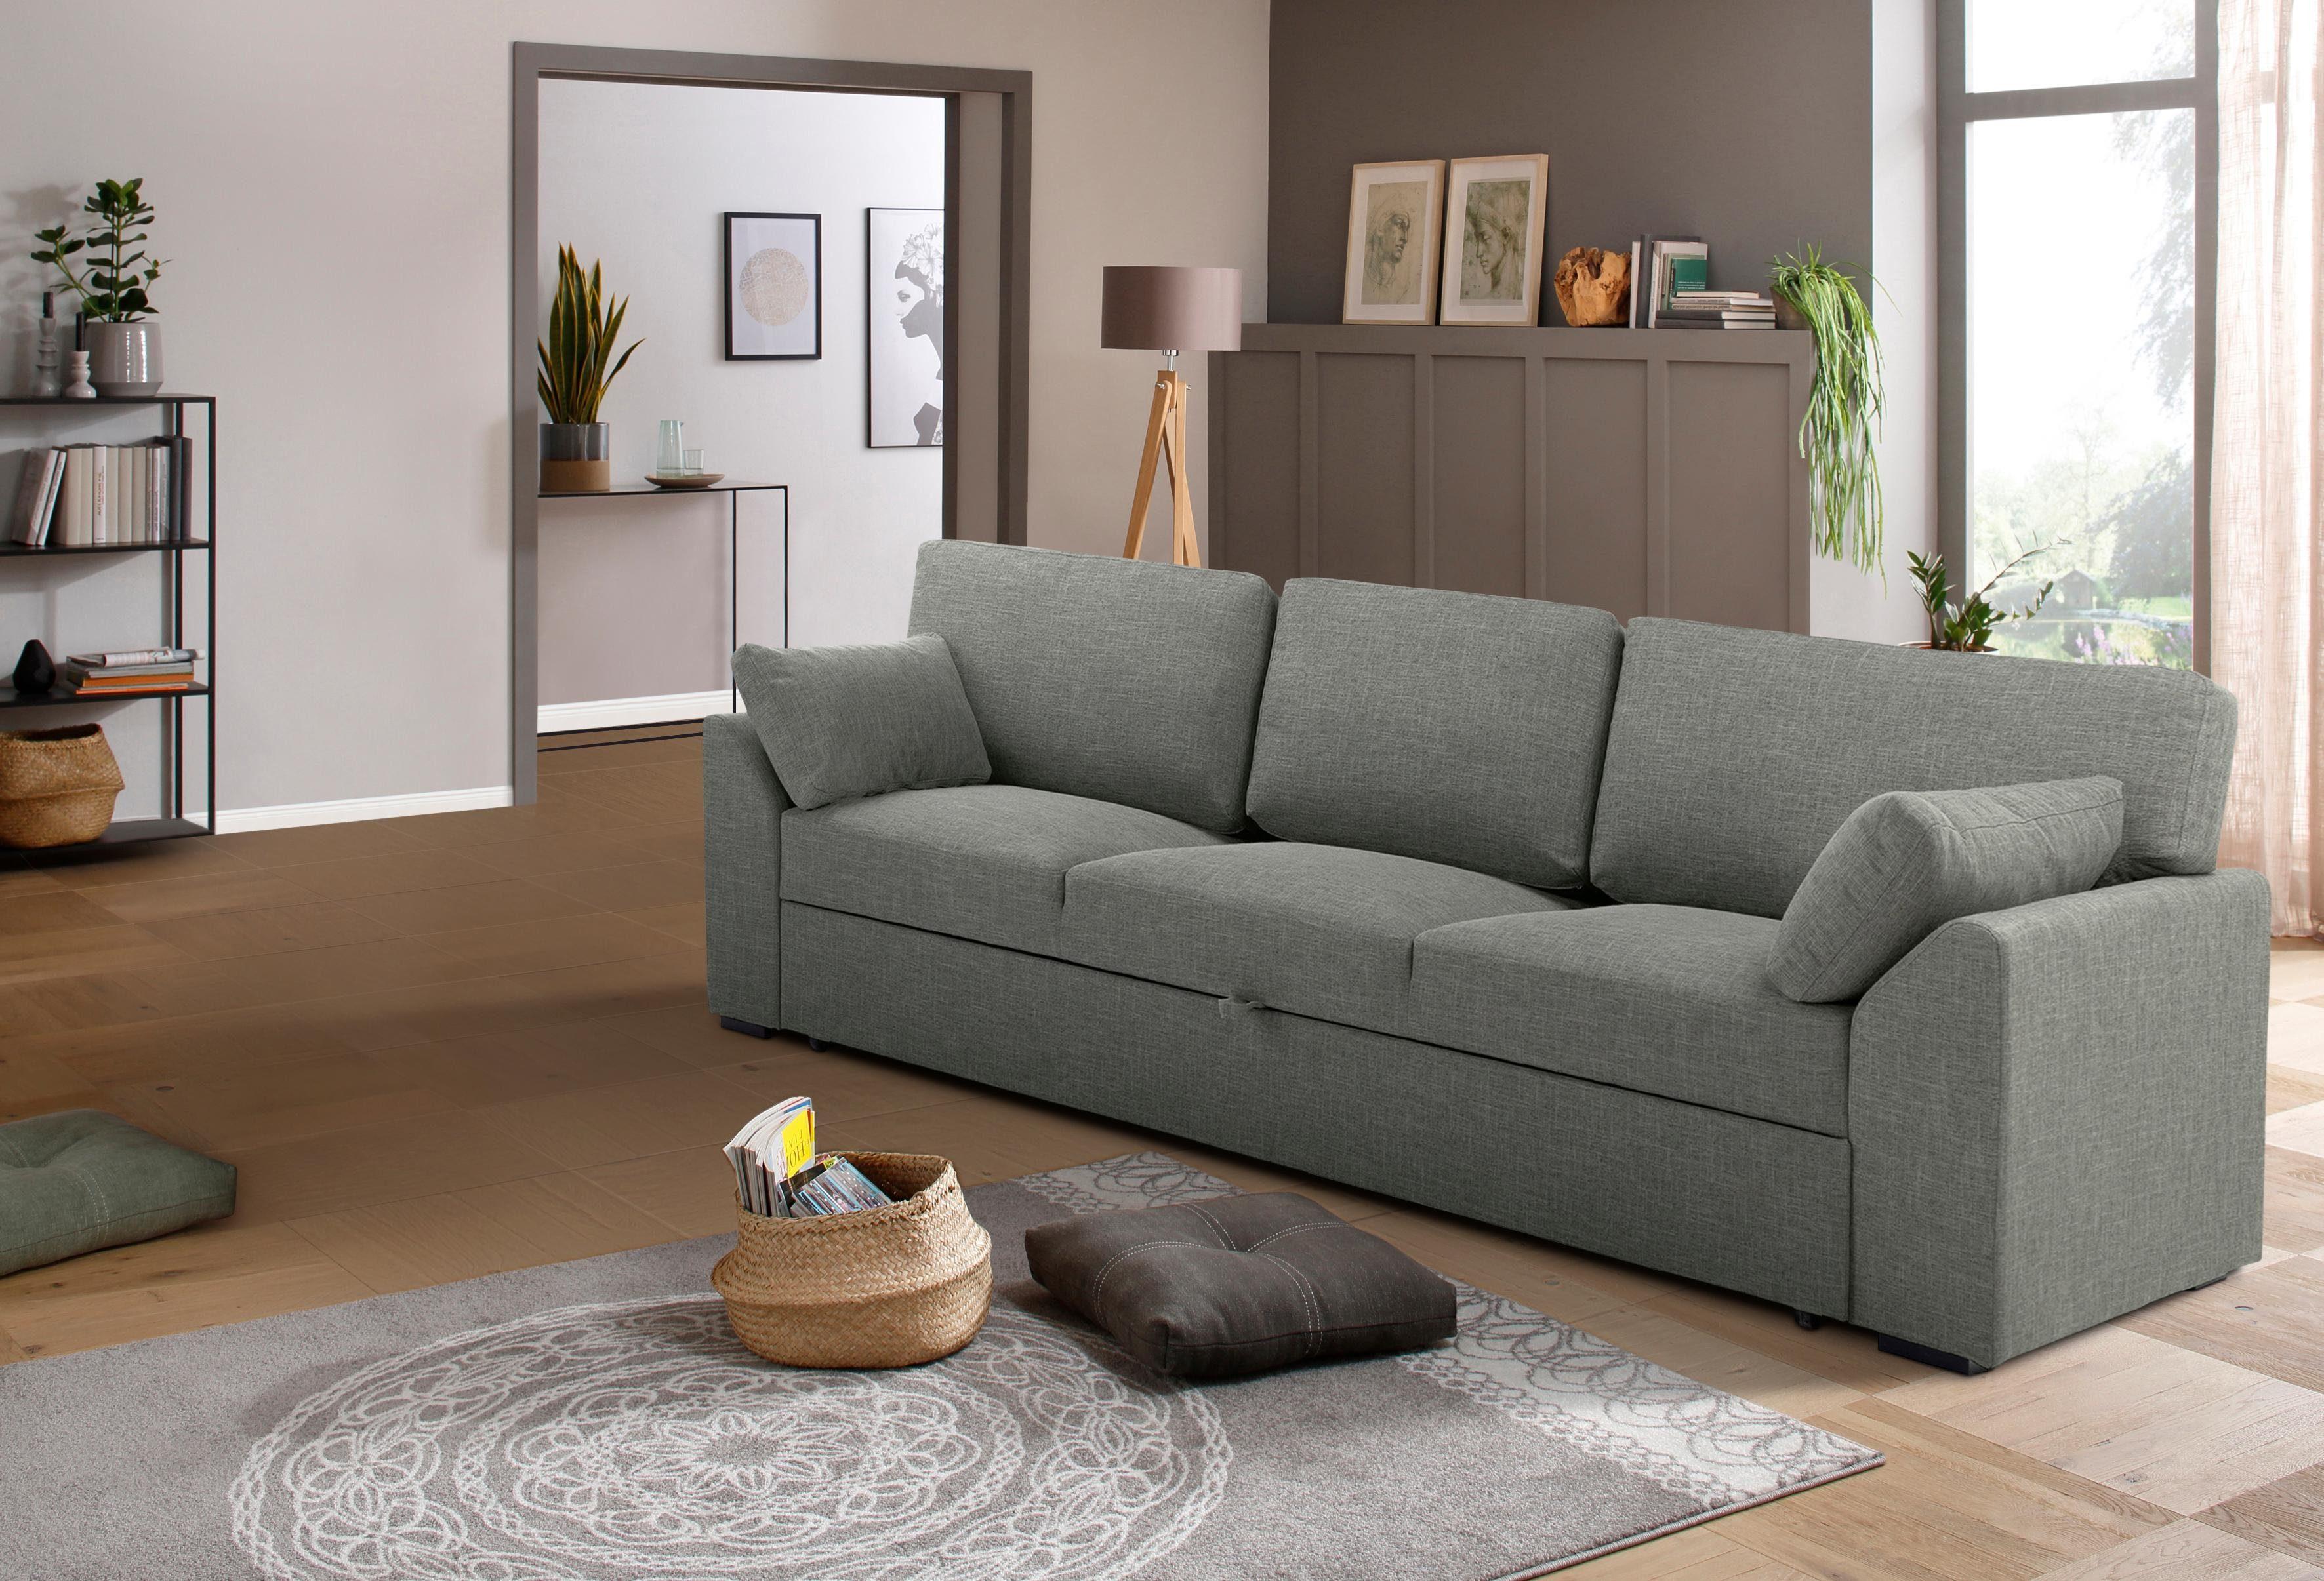 Premium collection by Home affaire Schlafsofa 2-Sitzer Garda